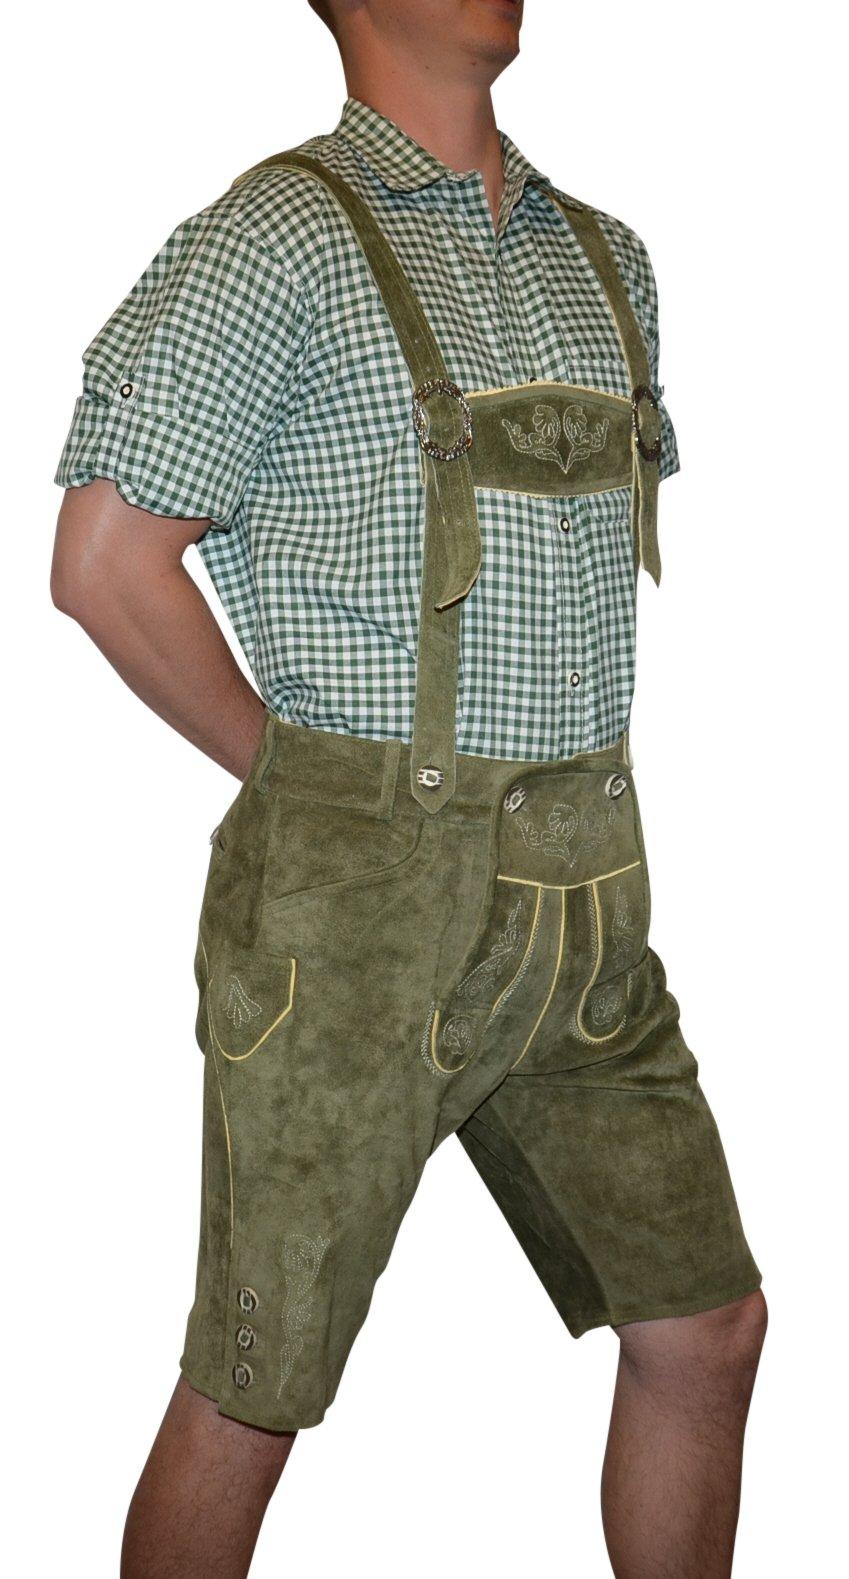 Trachten 2-Piece Leather German Oktoberfest Lederhosen Shorts 36 Loden Green